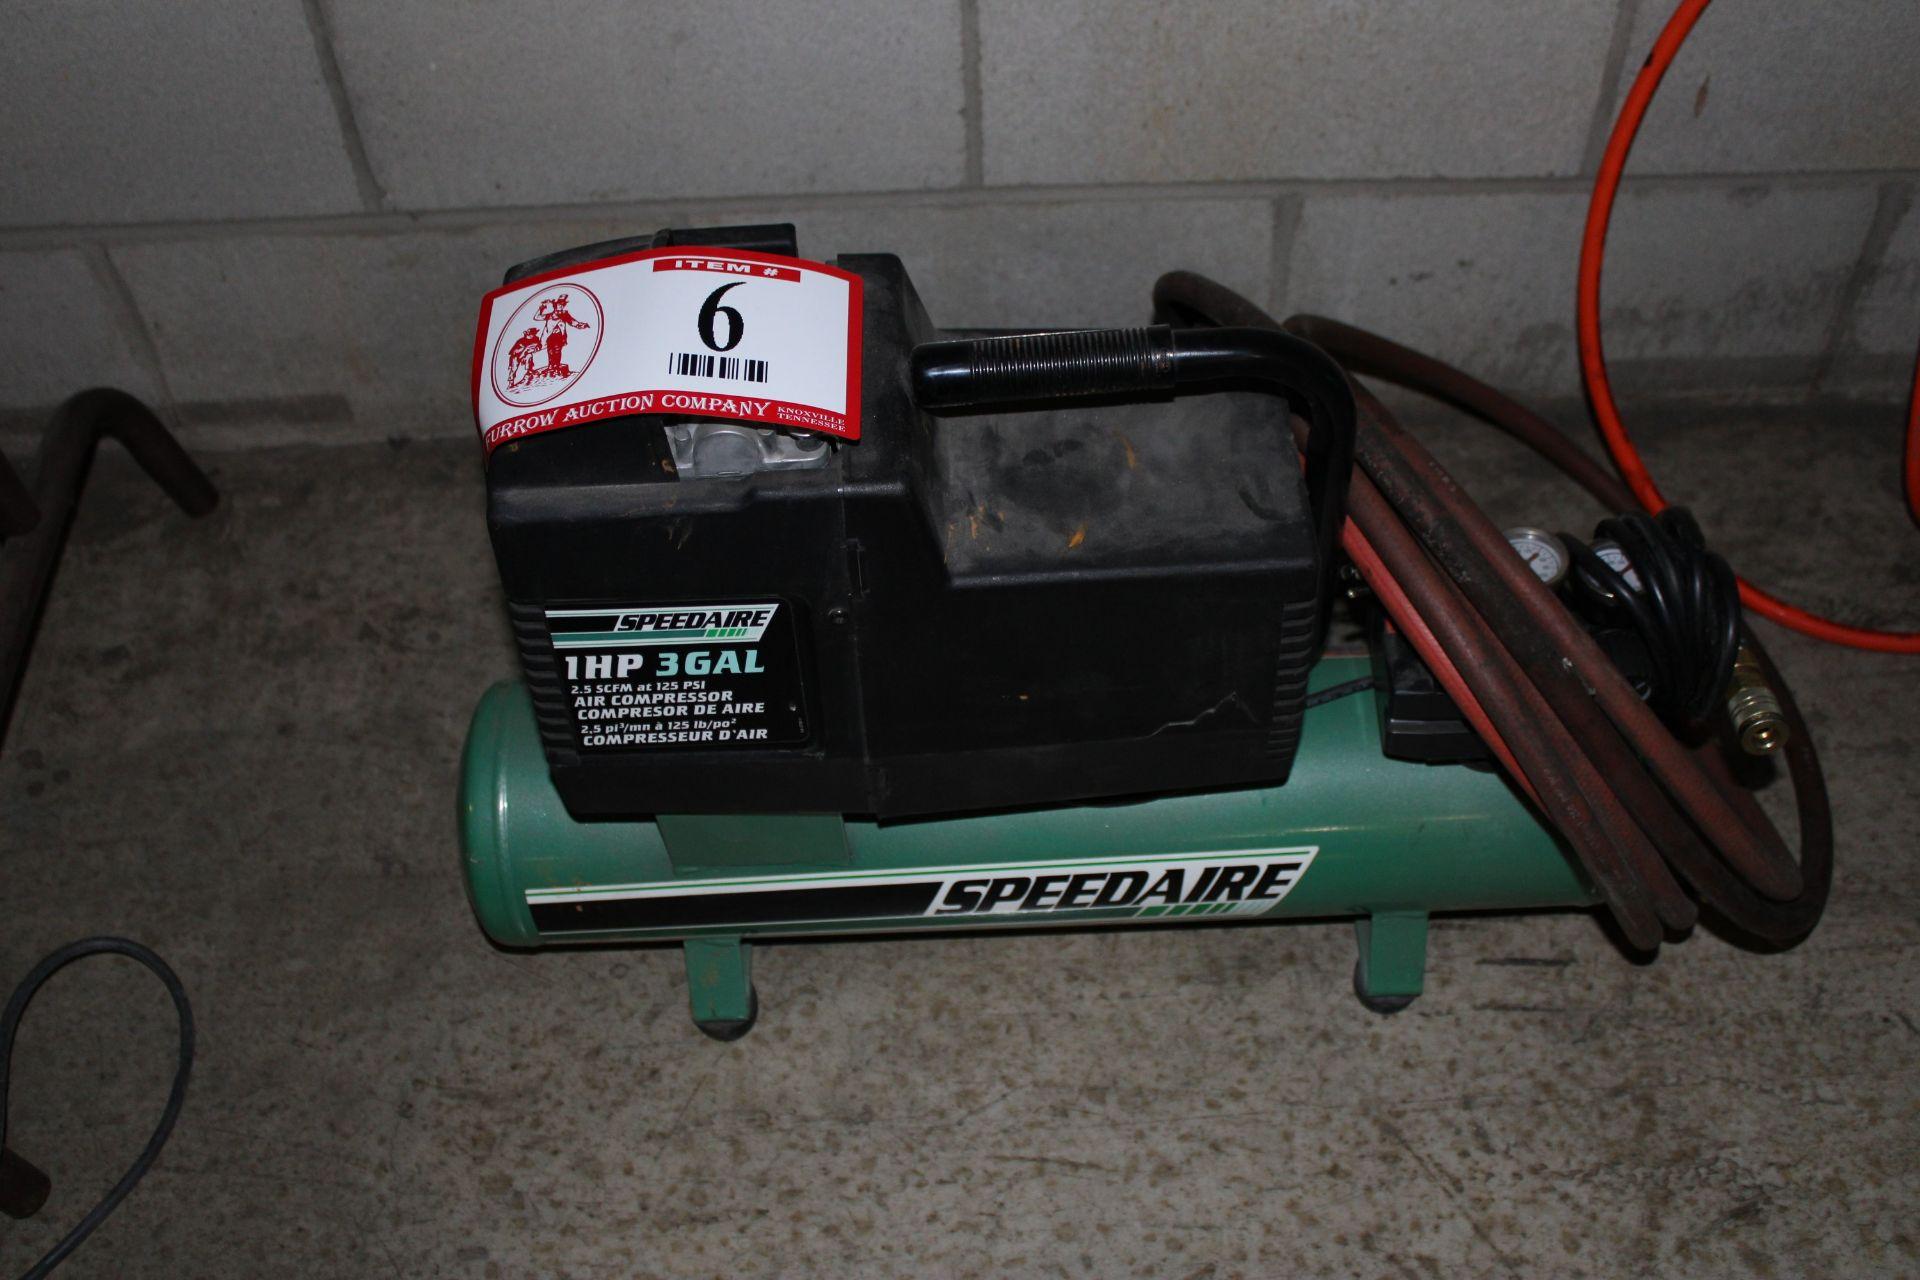 Lot 6 - Speed Air 1hp 3 Gallon Portable Electric Air Compressor